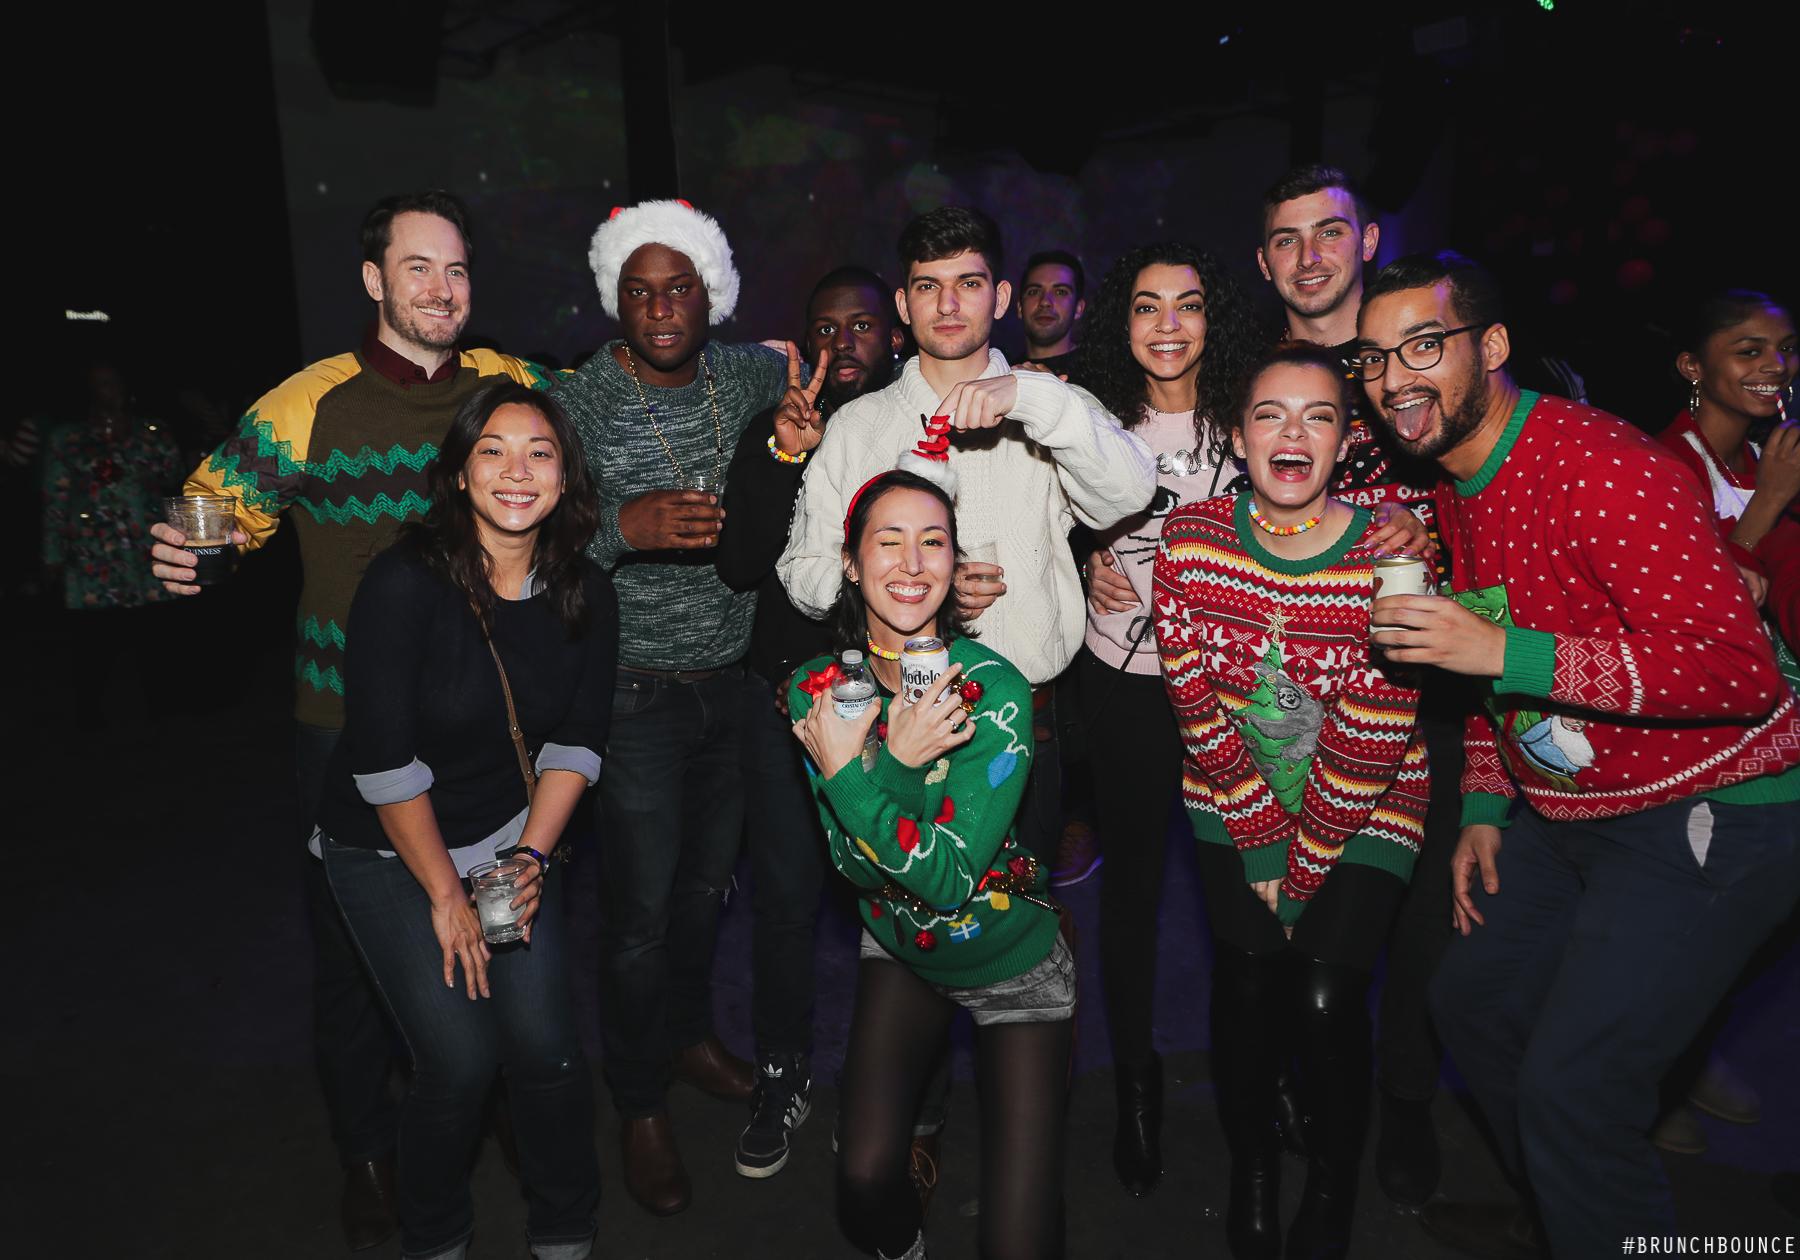 Brunch Bounce Ugly Sweater 2018-18.jpg